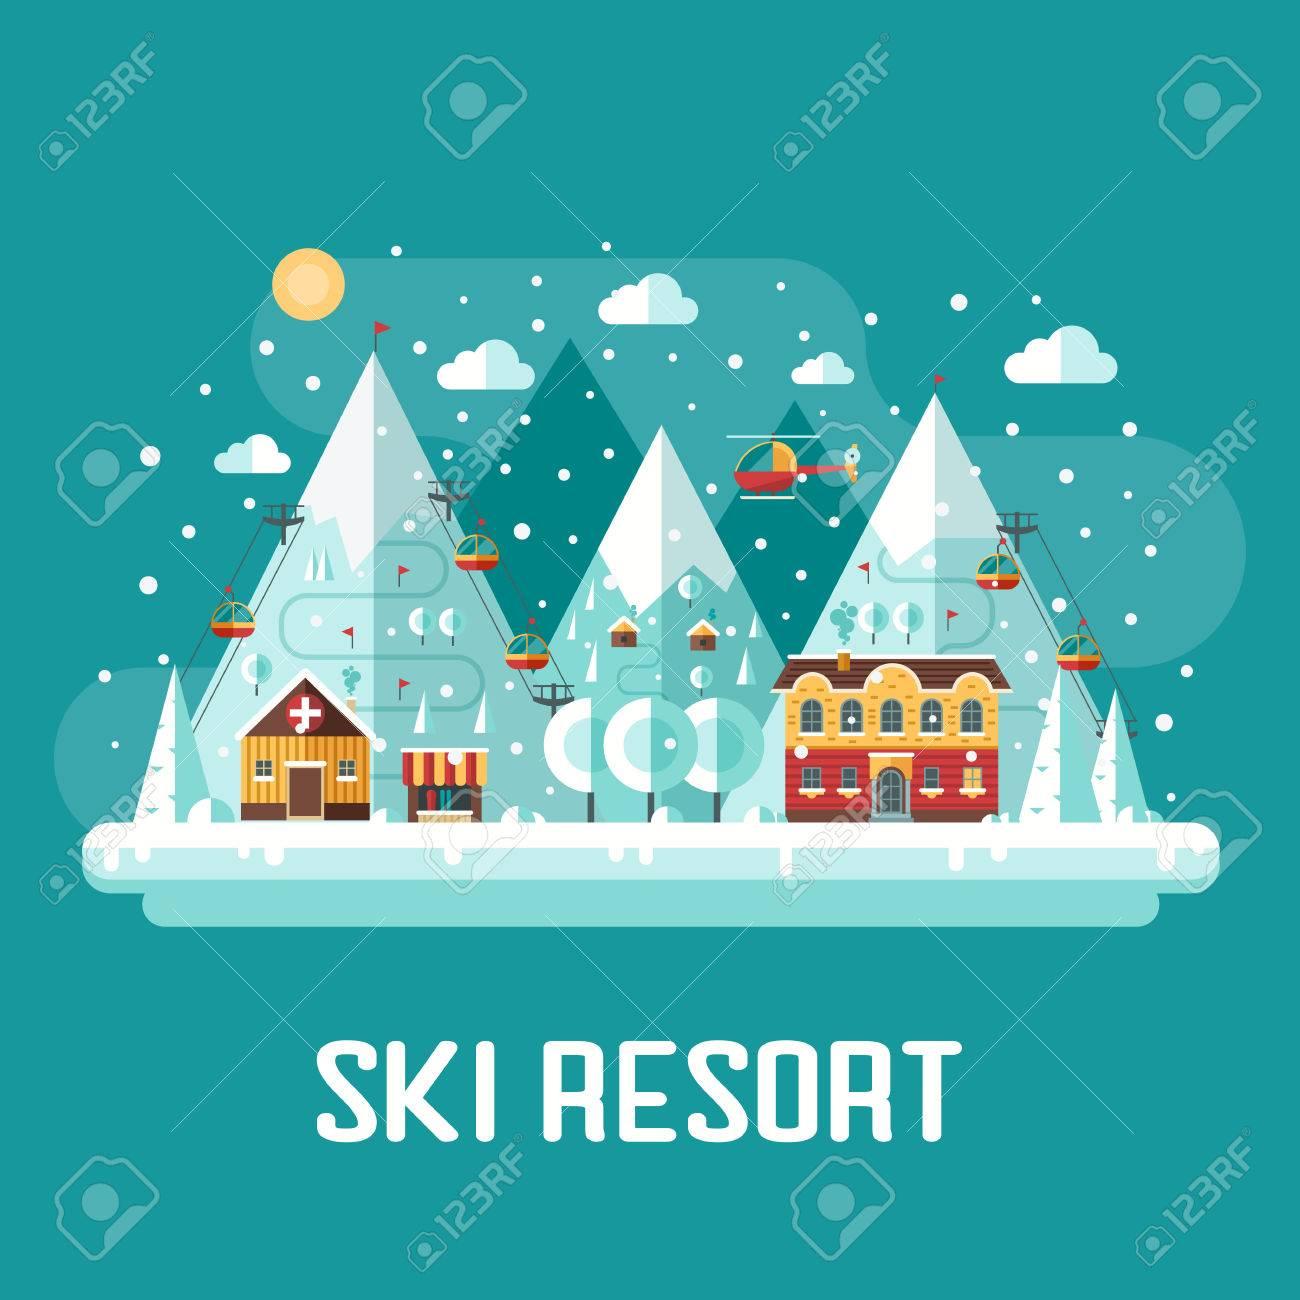 Winter Vacation Flat Landscape Mountain Ski Resort Concept Scene